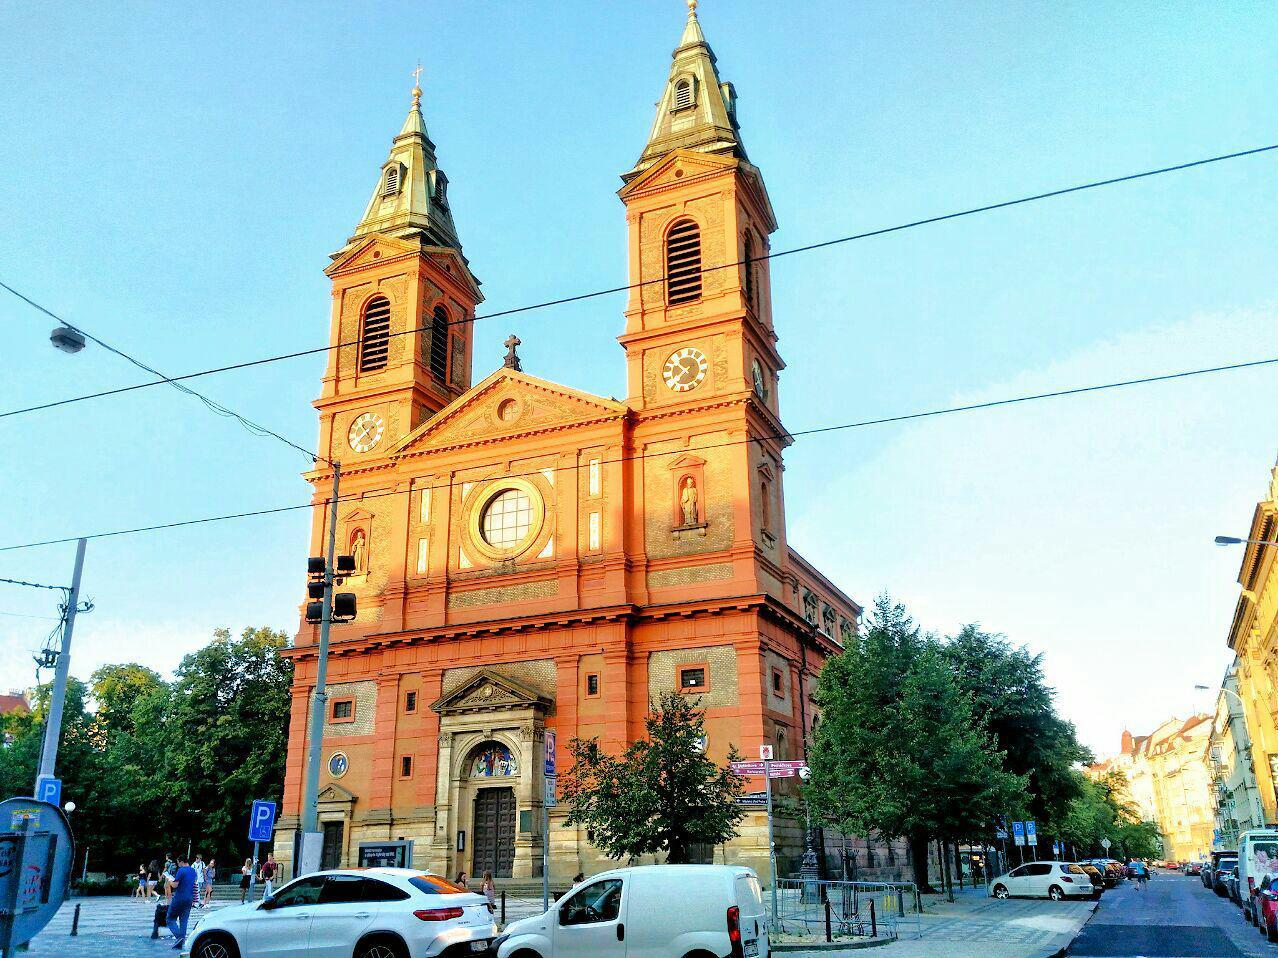 Костел Святого Вацлава в Смихове, Прага, Чехия. Июль, 2018